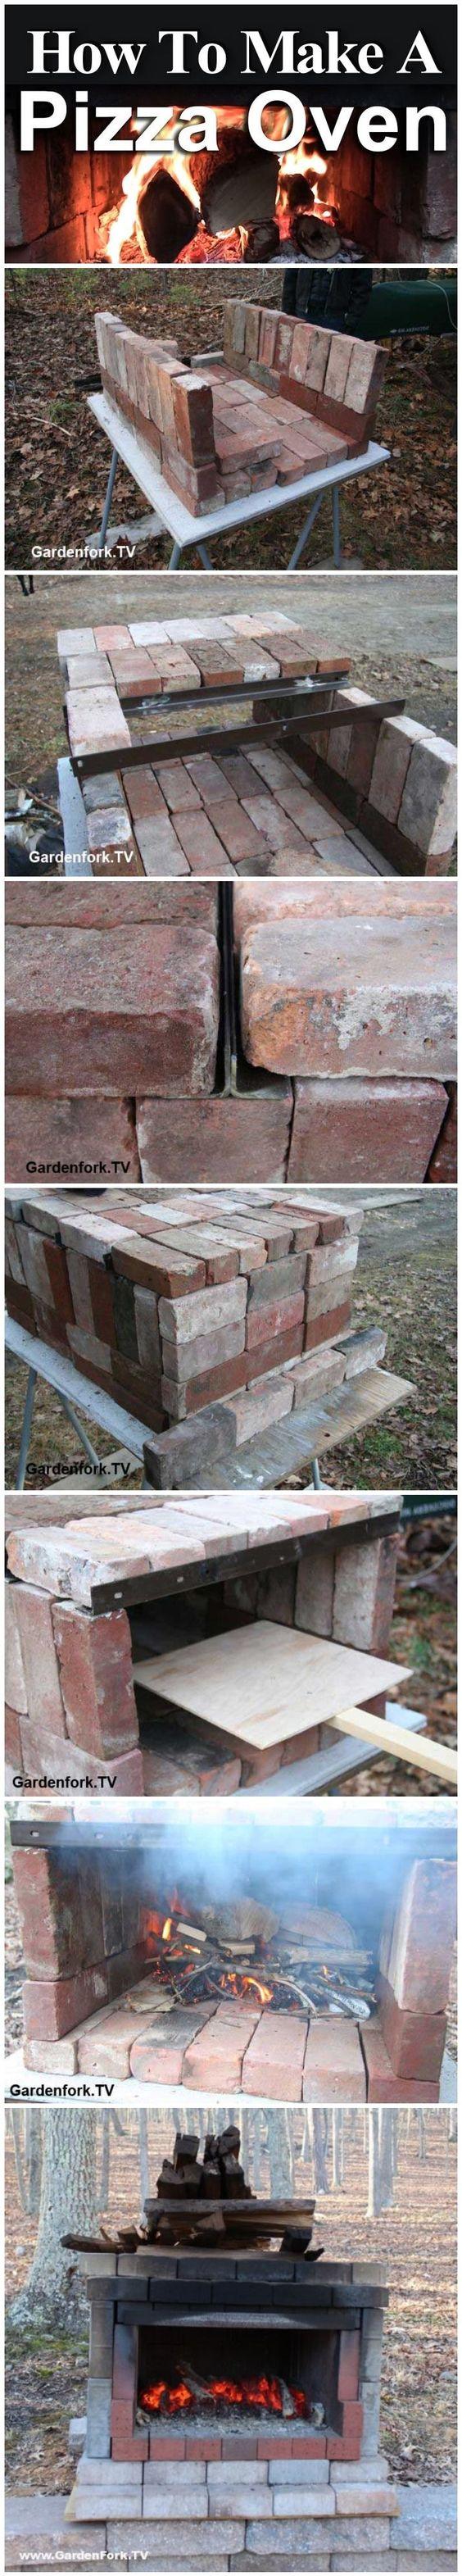 how to make your own brick pizza oven brick backyard diy build diy